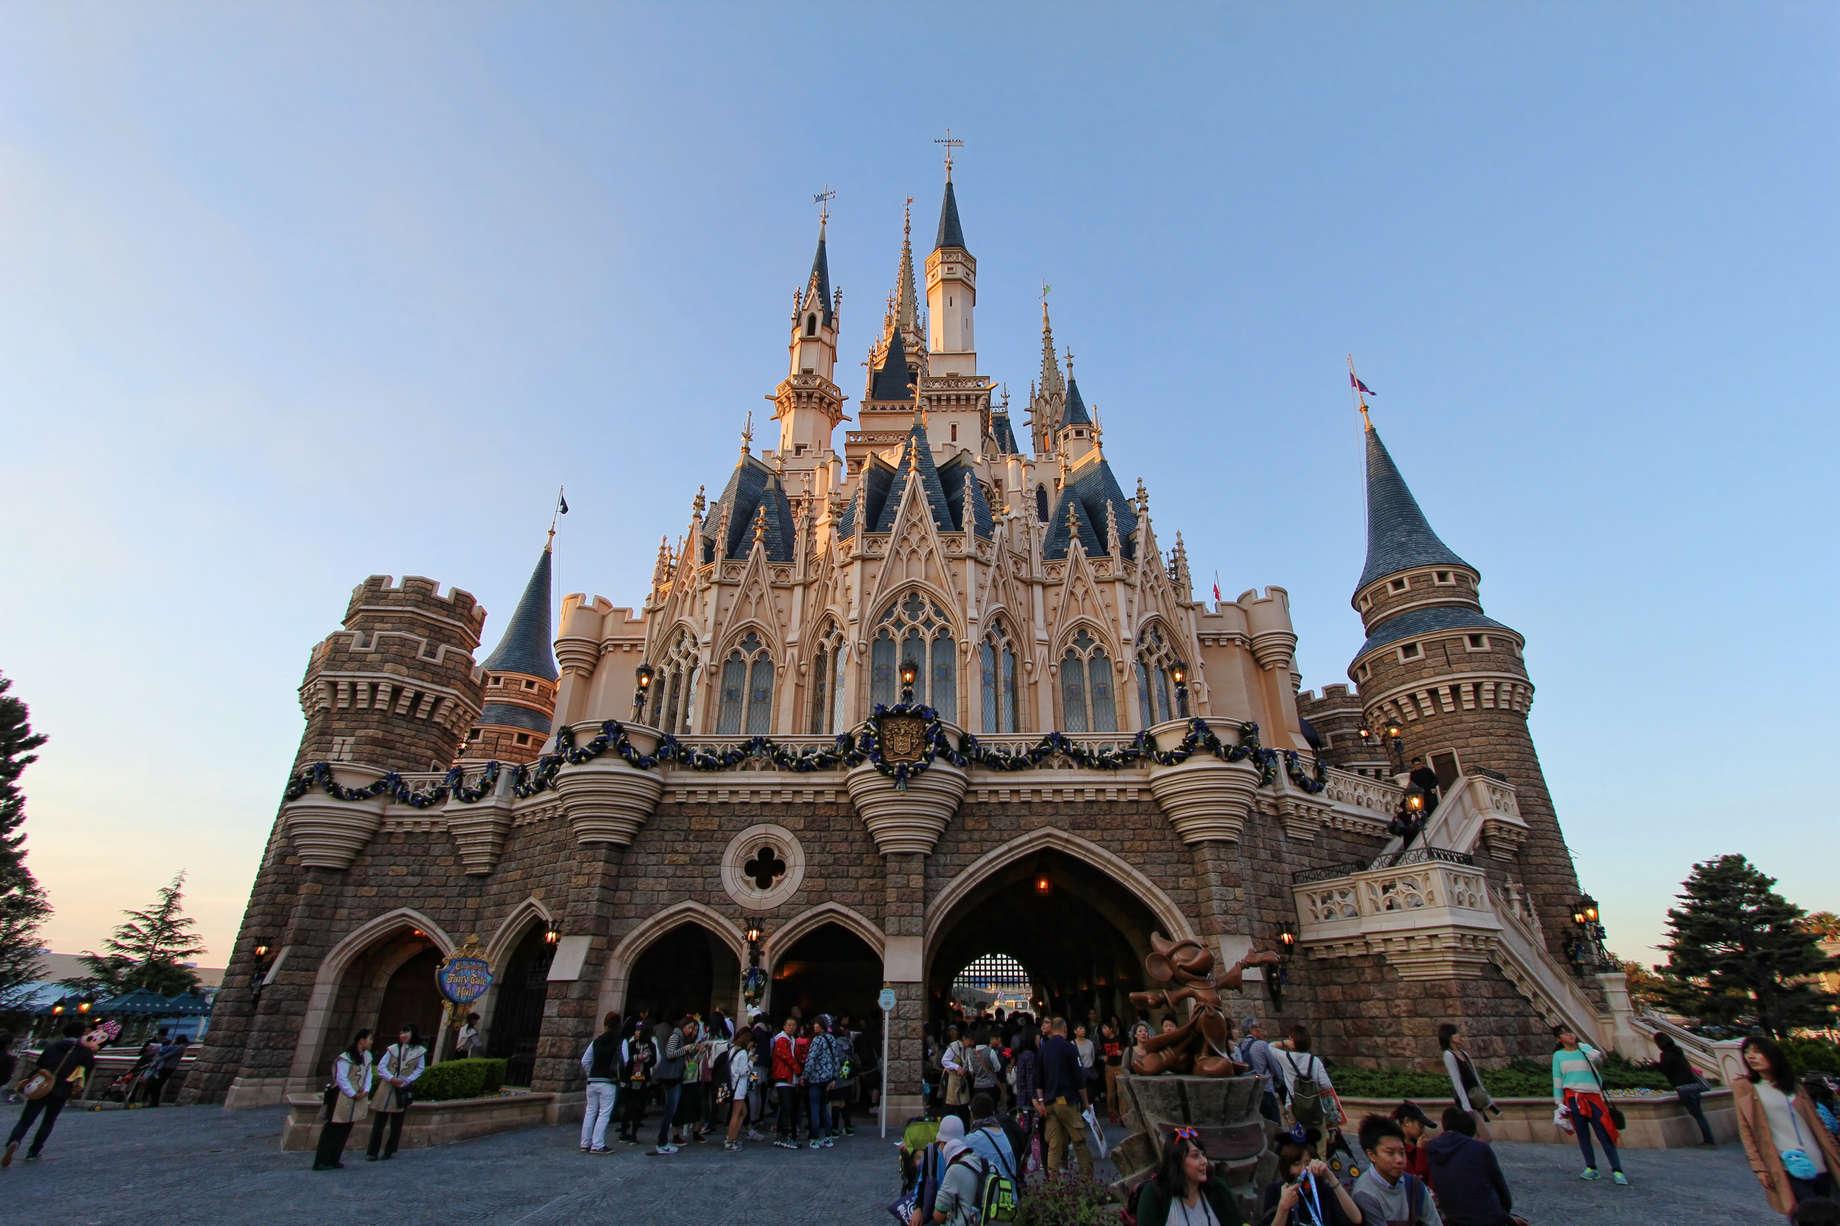 Disney Dark Kingdom: Rumored Disney Villain Theme Park Plans